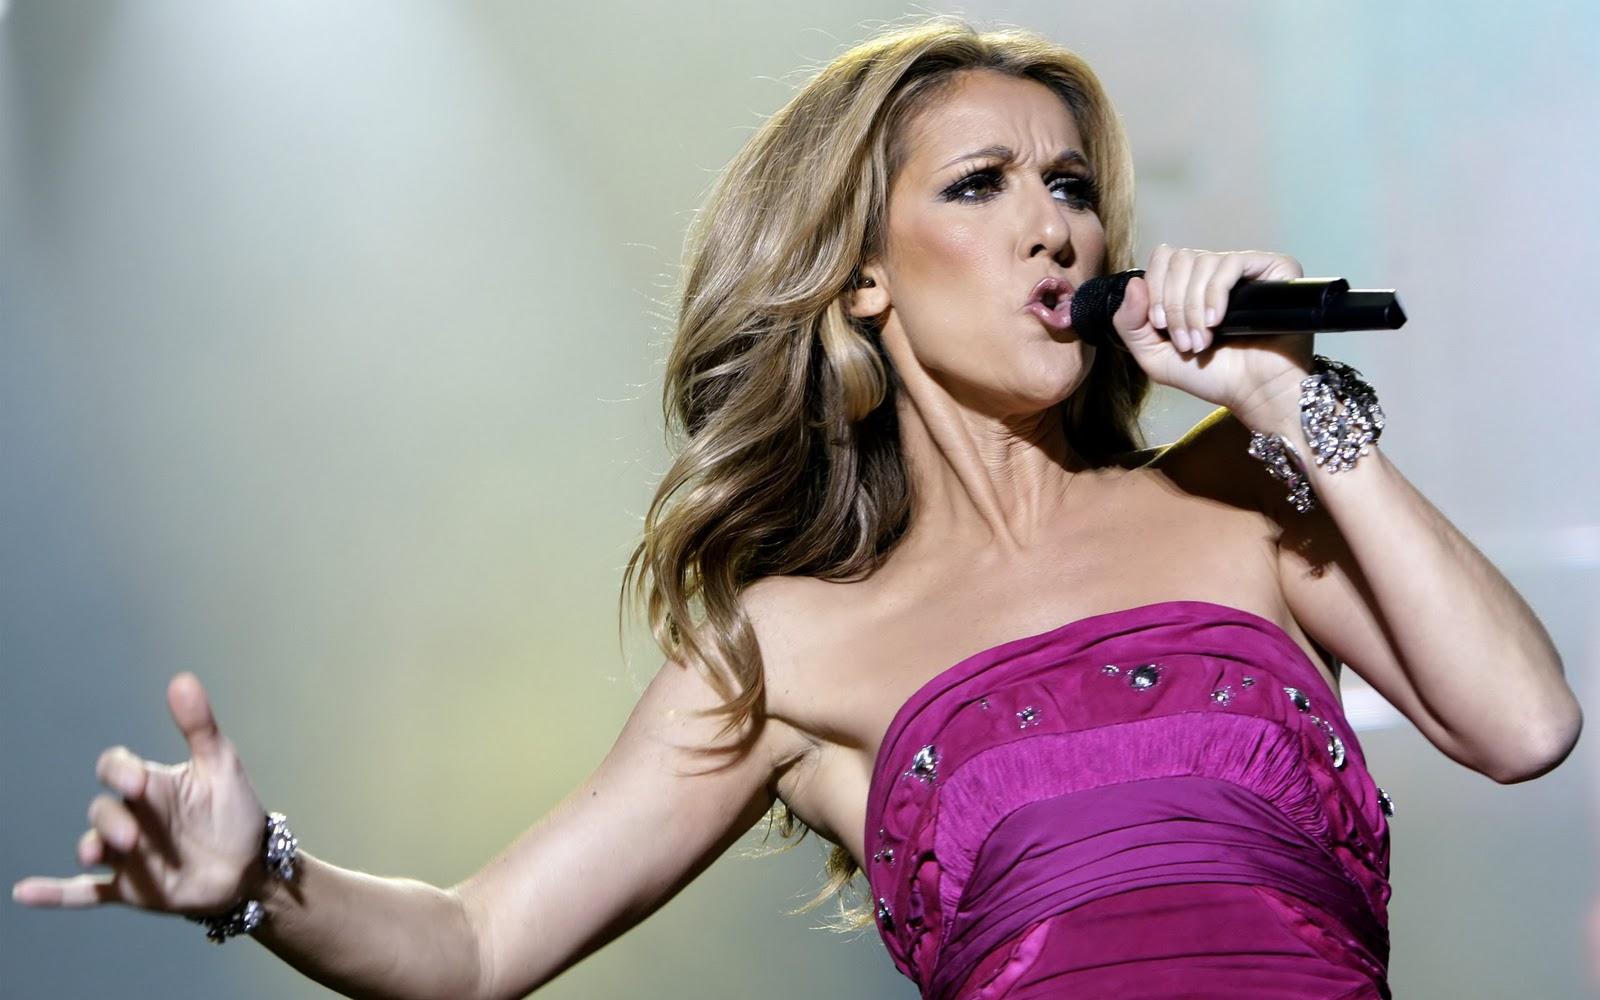 http://4.bp.blogspot.com/_KAonA6WY1Qk/TL83k2zz1dI/AAAAAAAAAA4/sCSYBqTE55Q/s1600/Celine_Dion_-_Songs.jpg